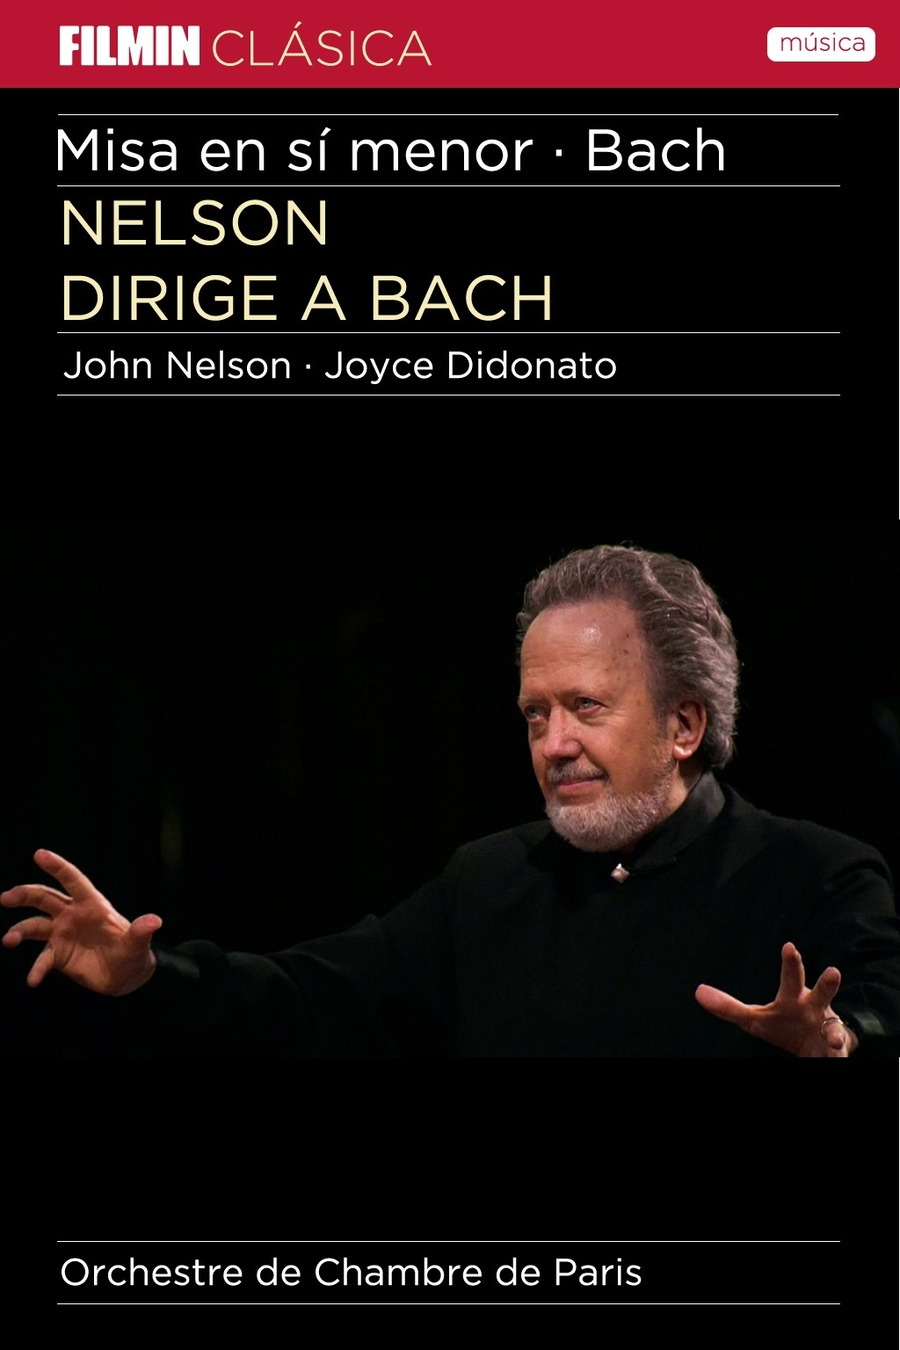 Nelson dirige a Bach